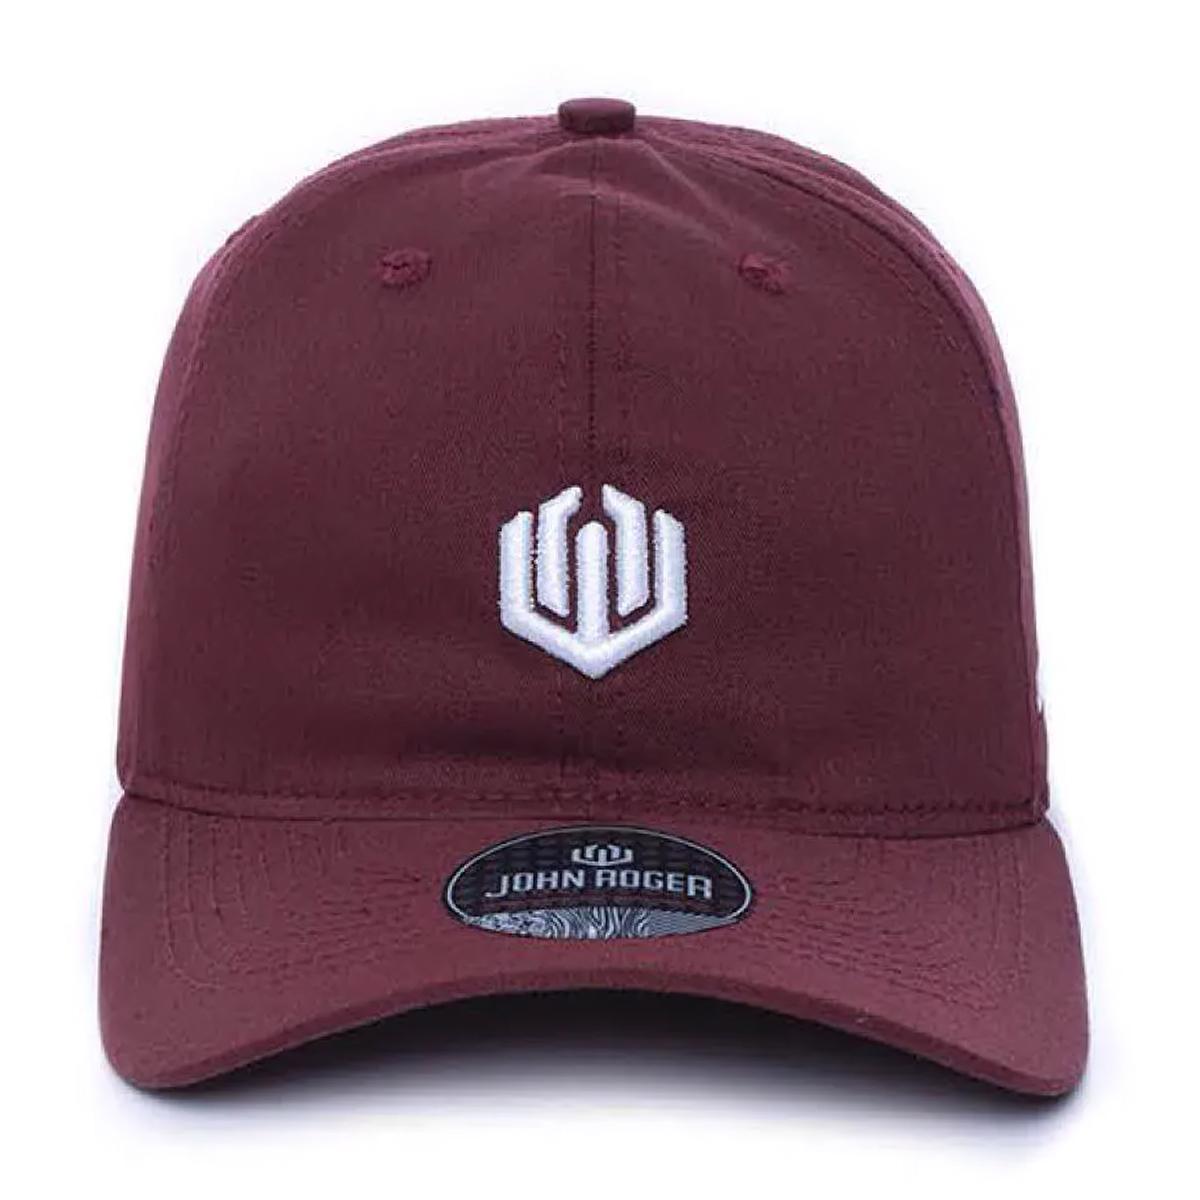 Boné John Roger - Vinho Dad hat